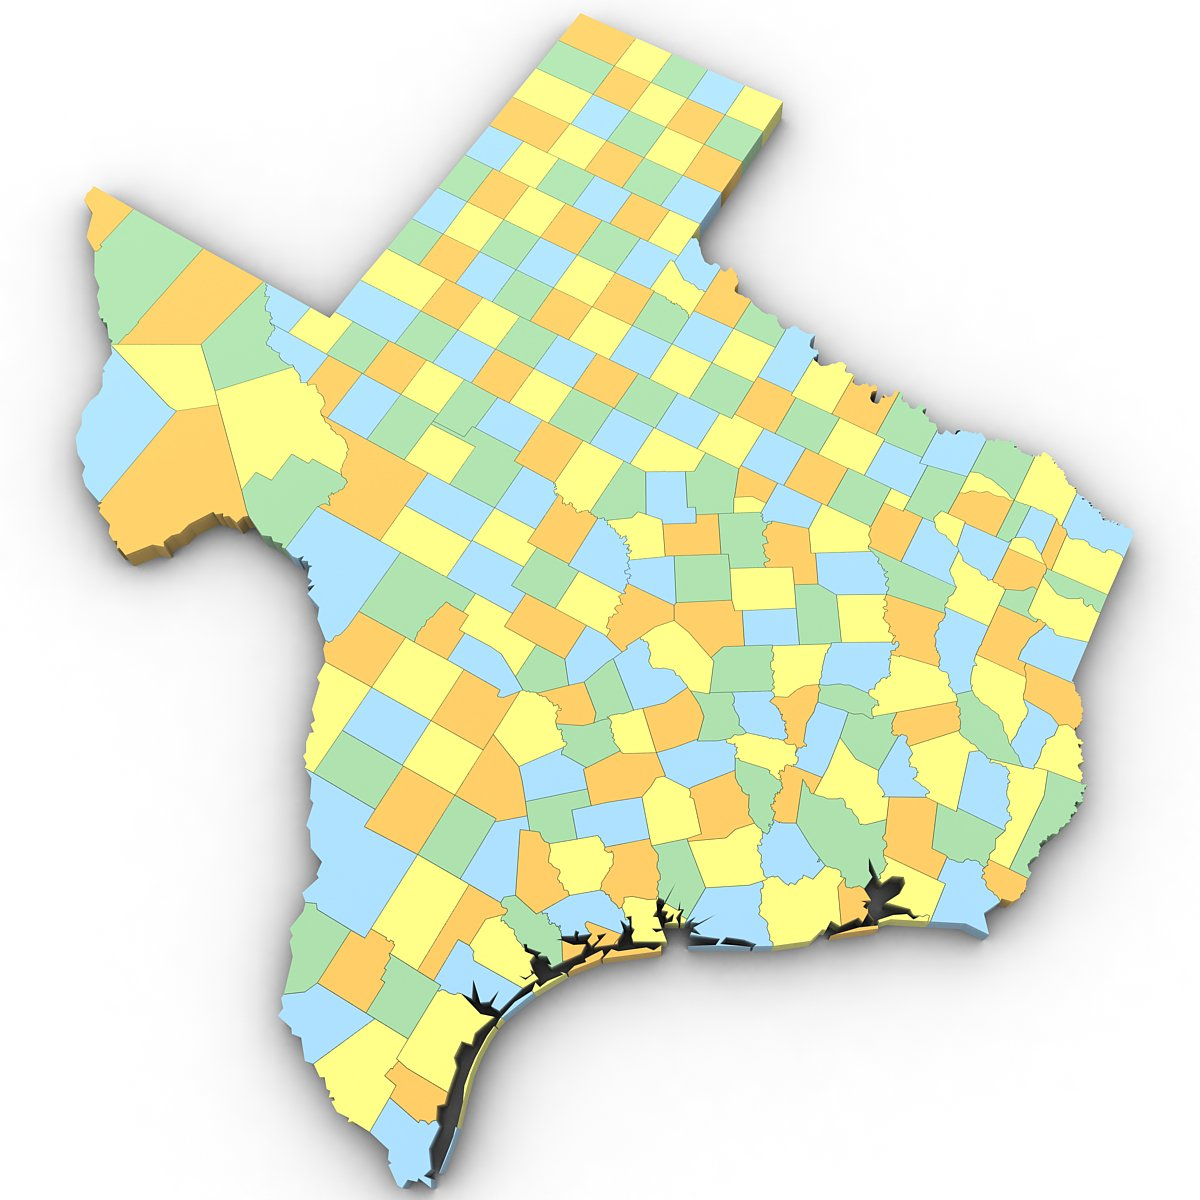 3d Map Of Texas.Texas Political Map 3d Model In Environment 3dexport